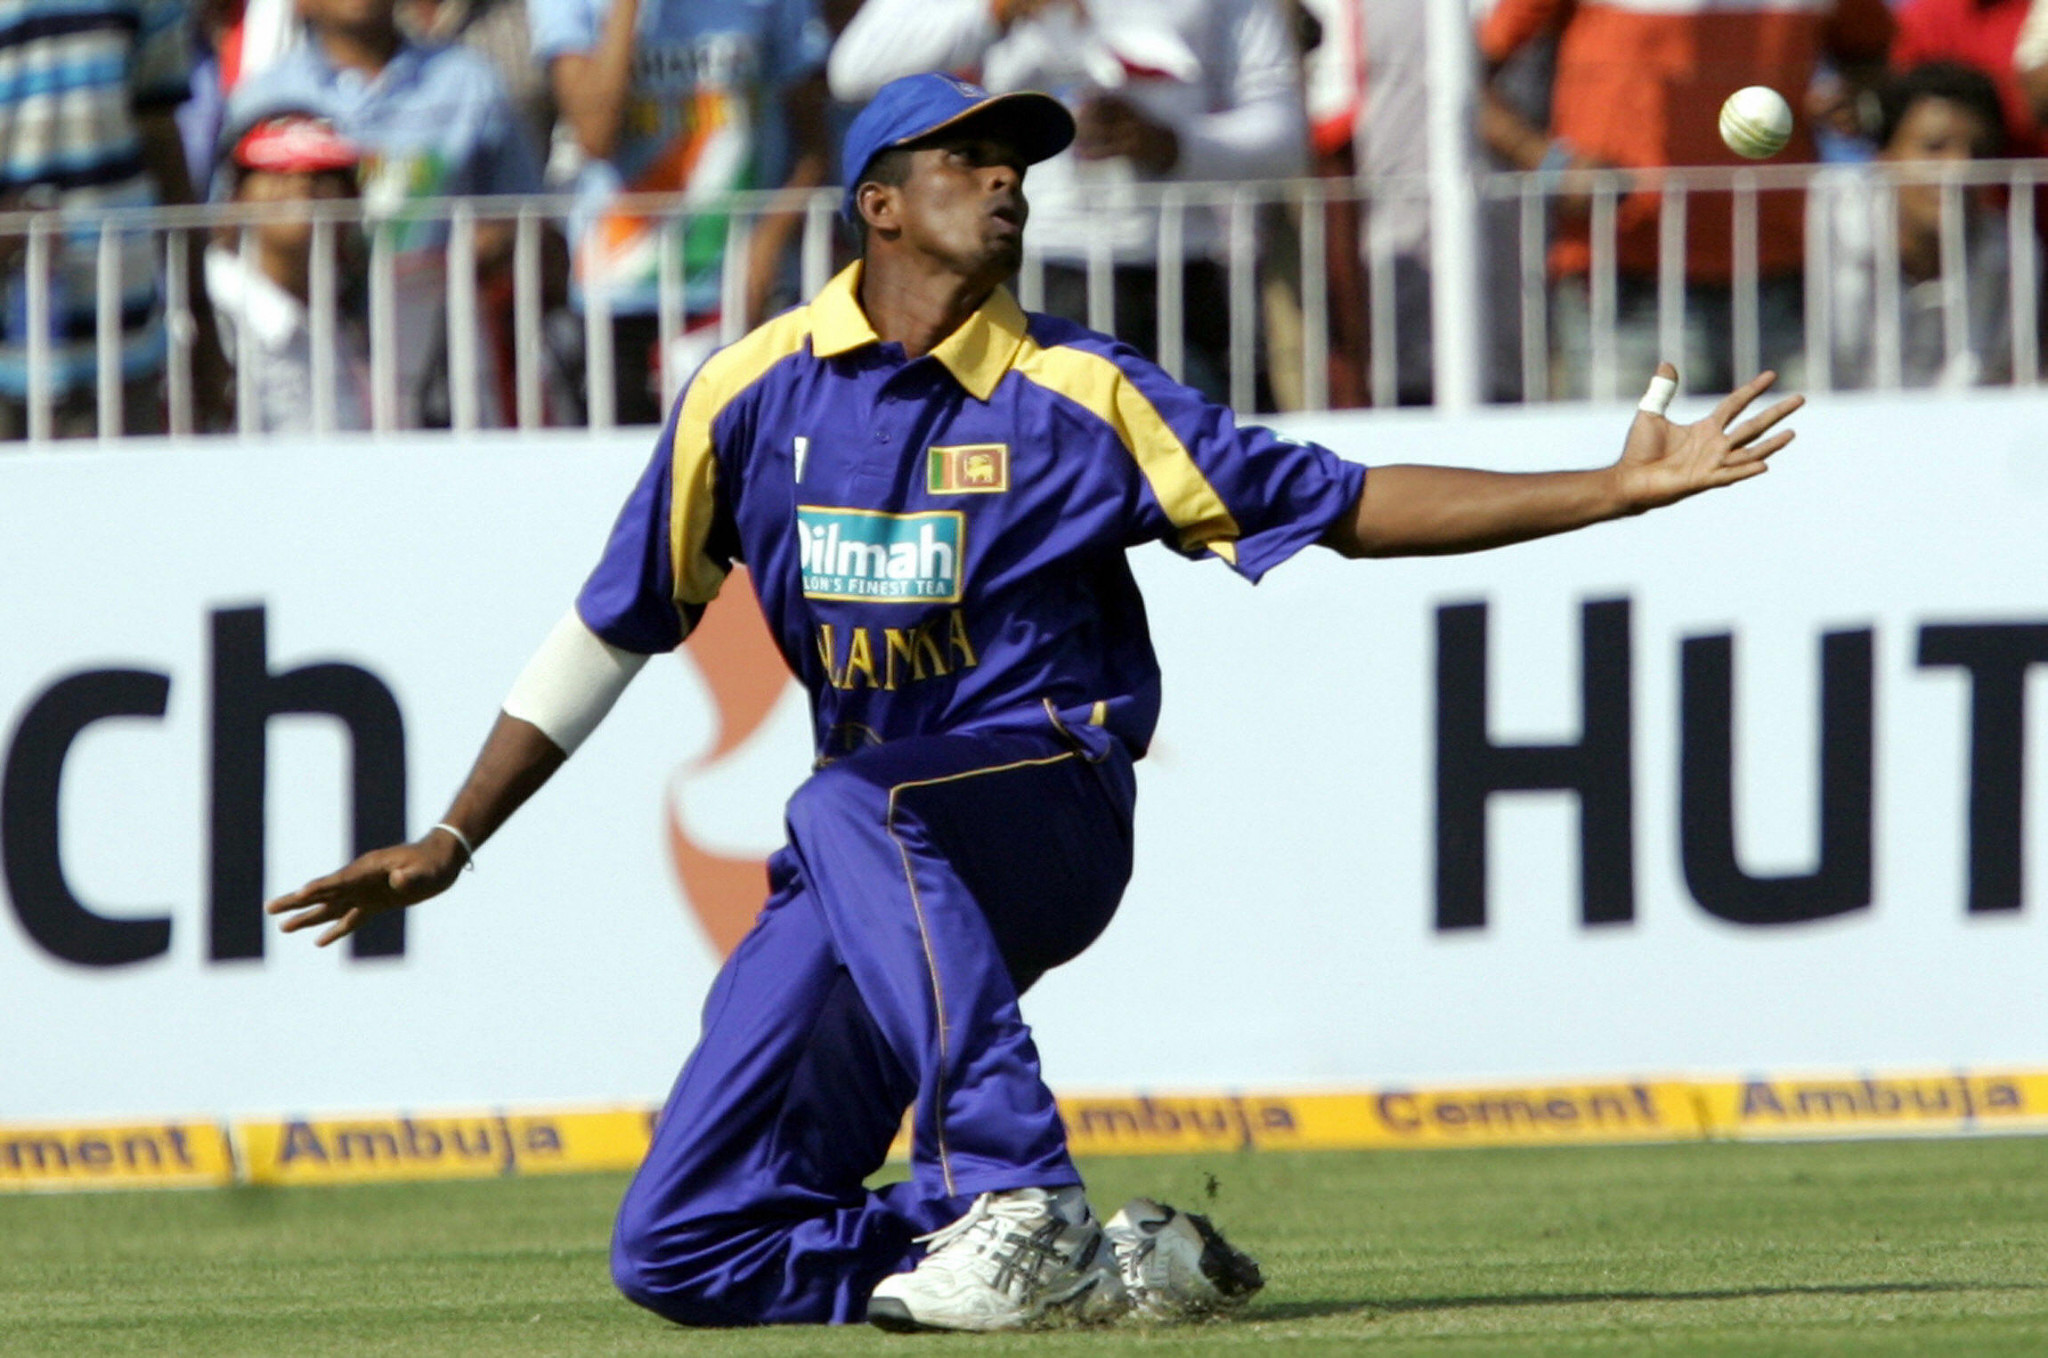 Dilhara Lokuhettige made 11 appearances for Sri Lanka in white-ball cricket ©Getty Images